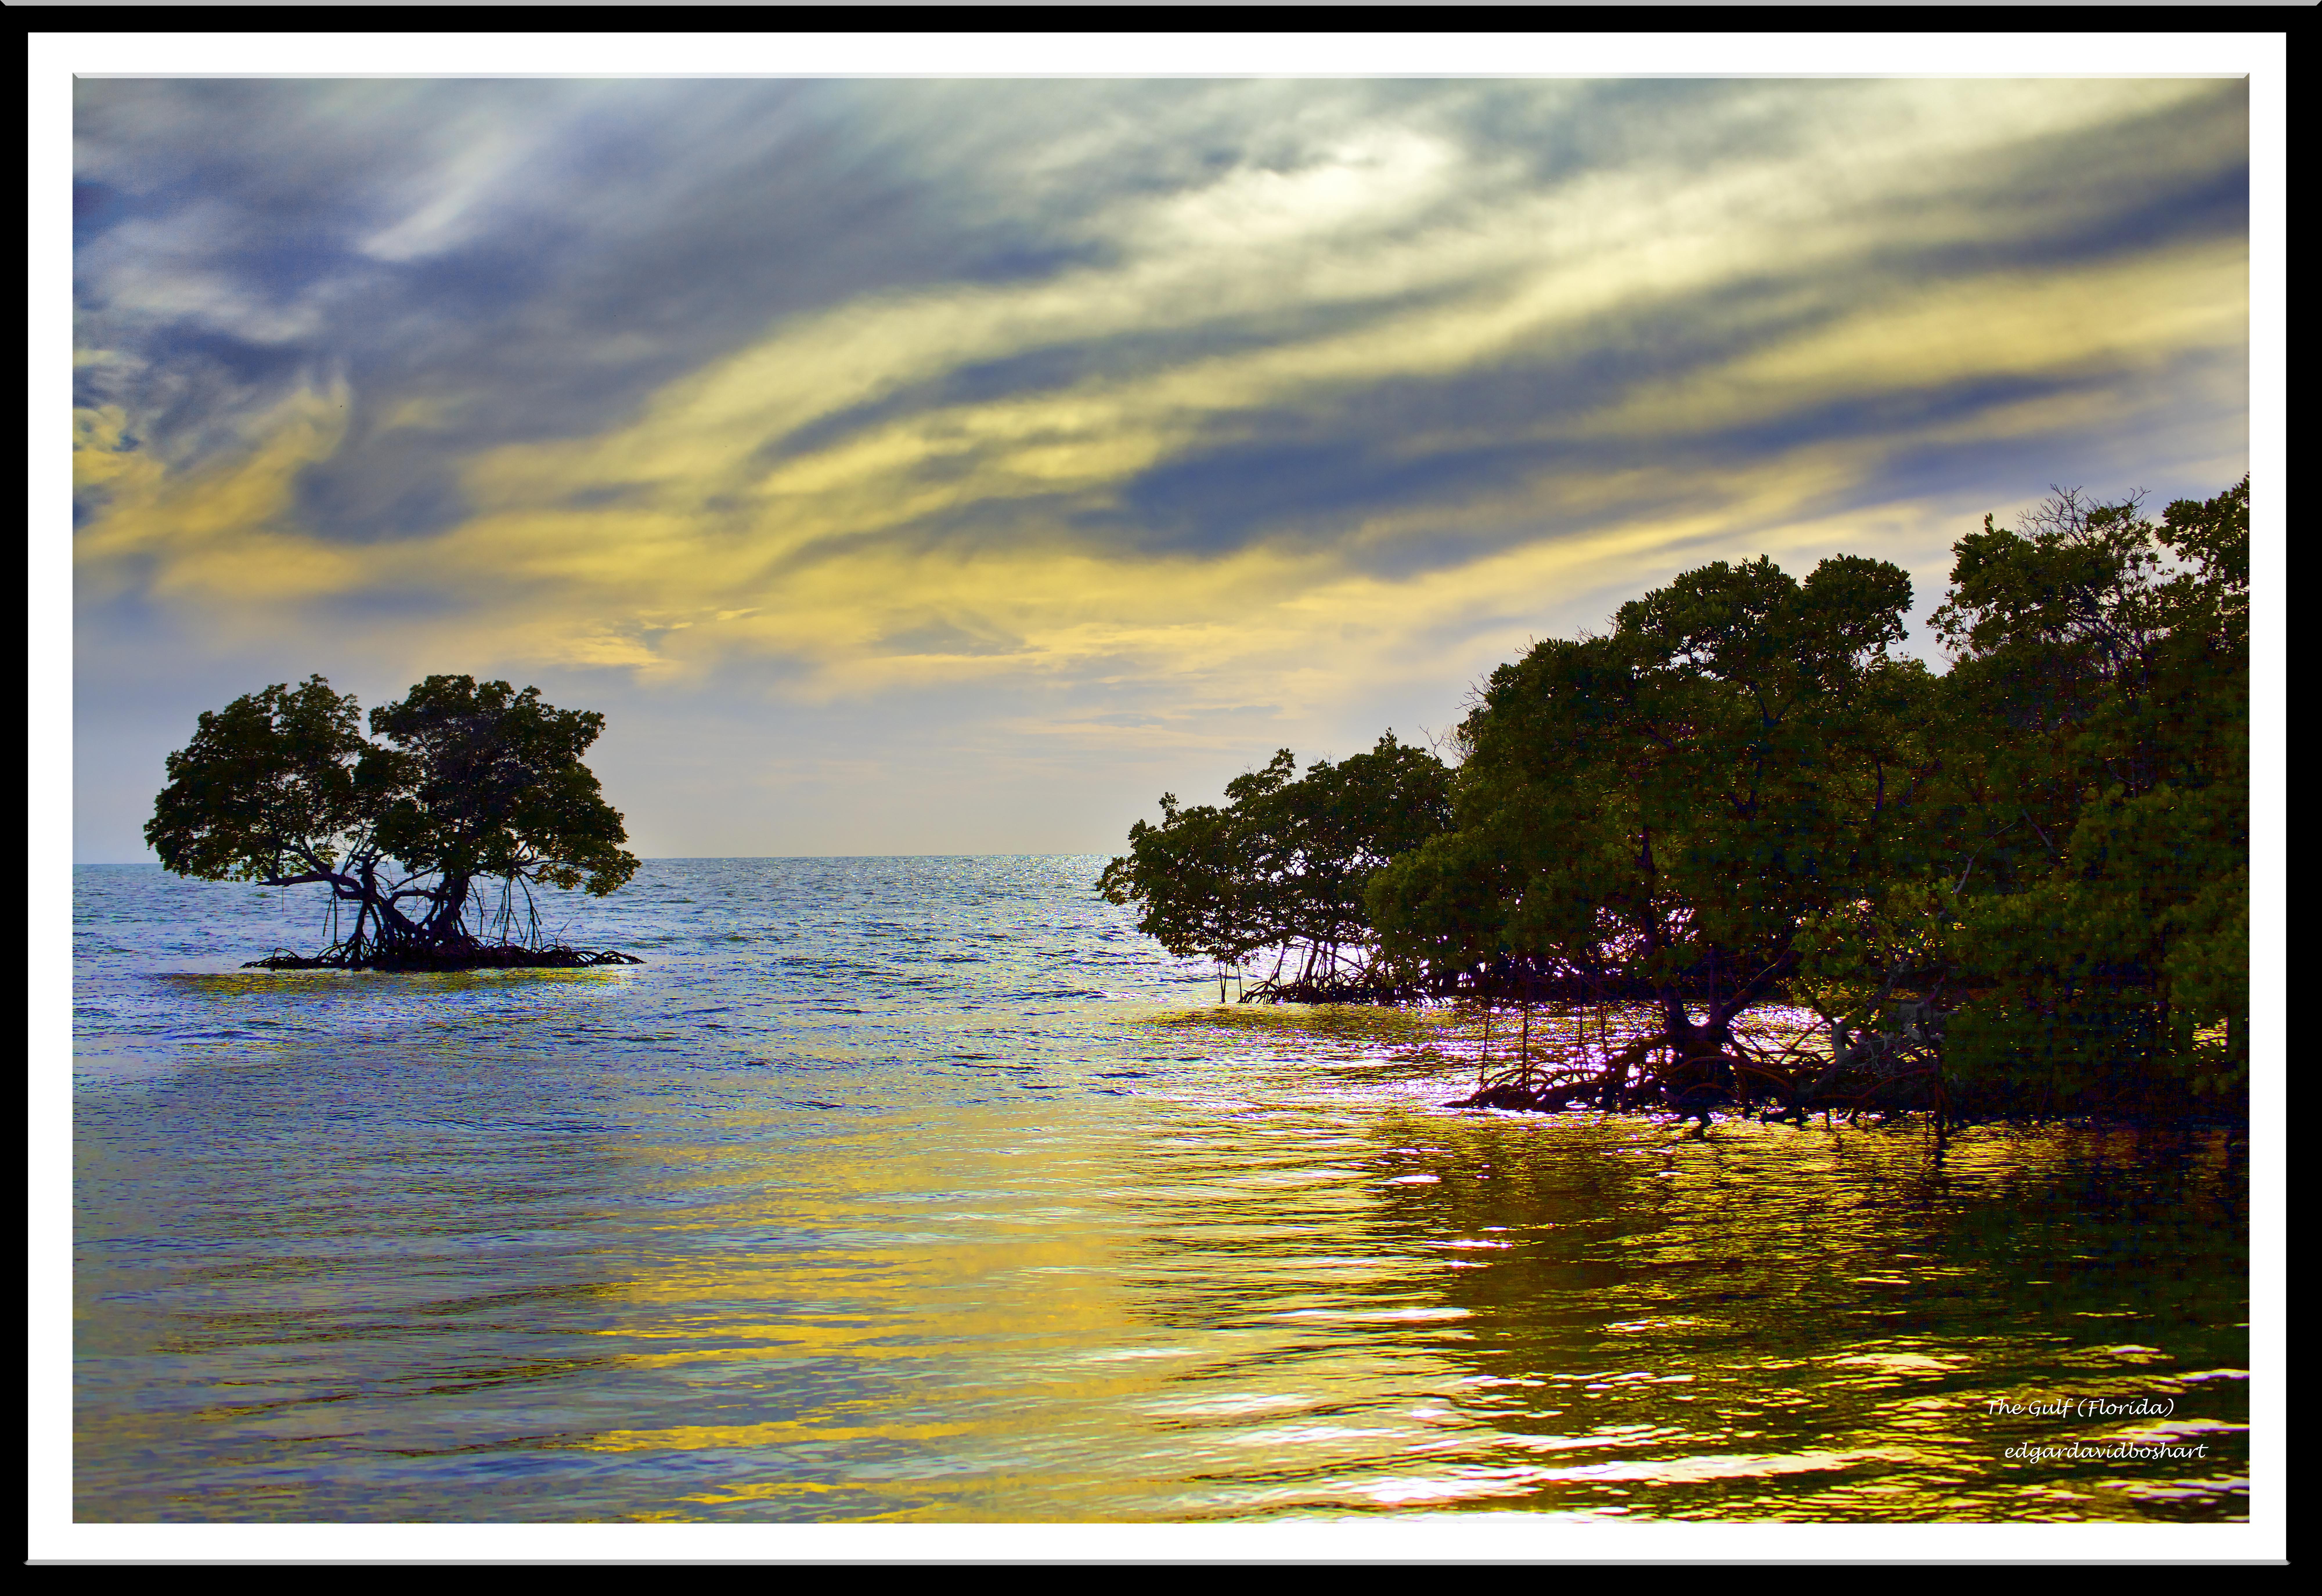 The Gulf, Florida